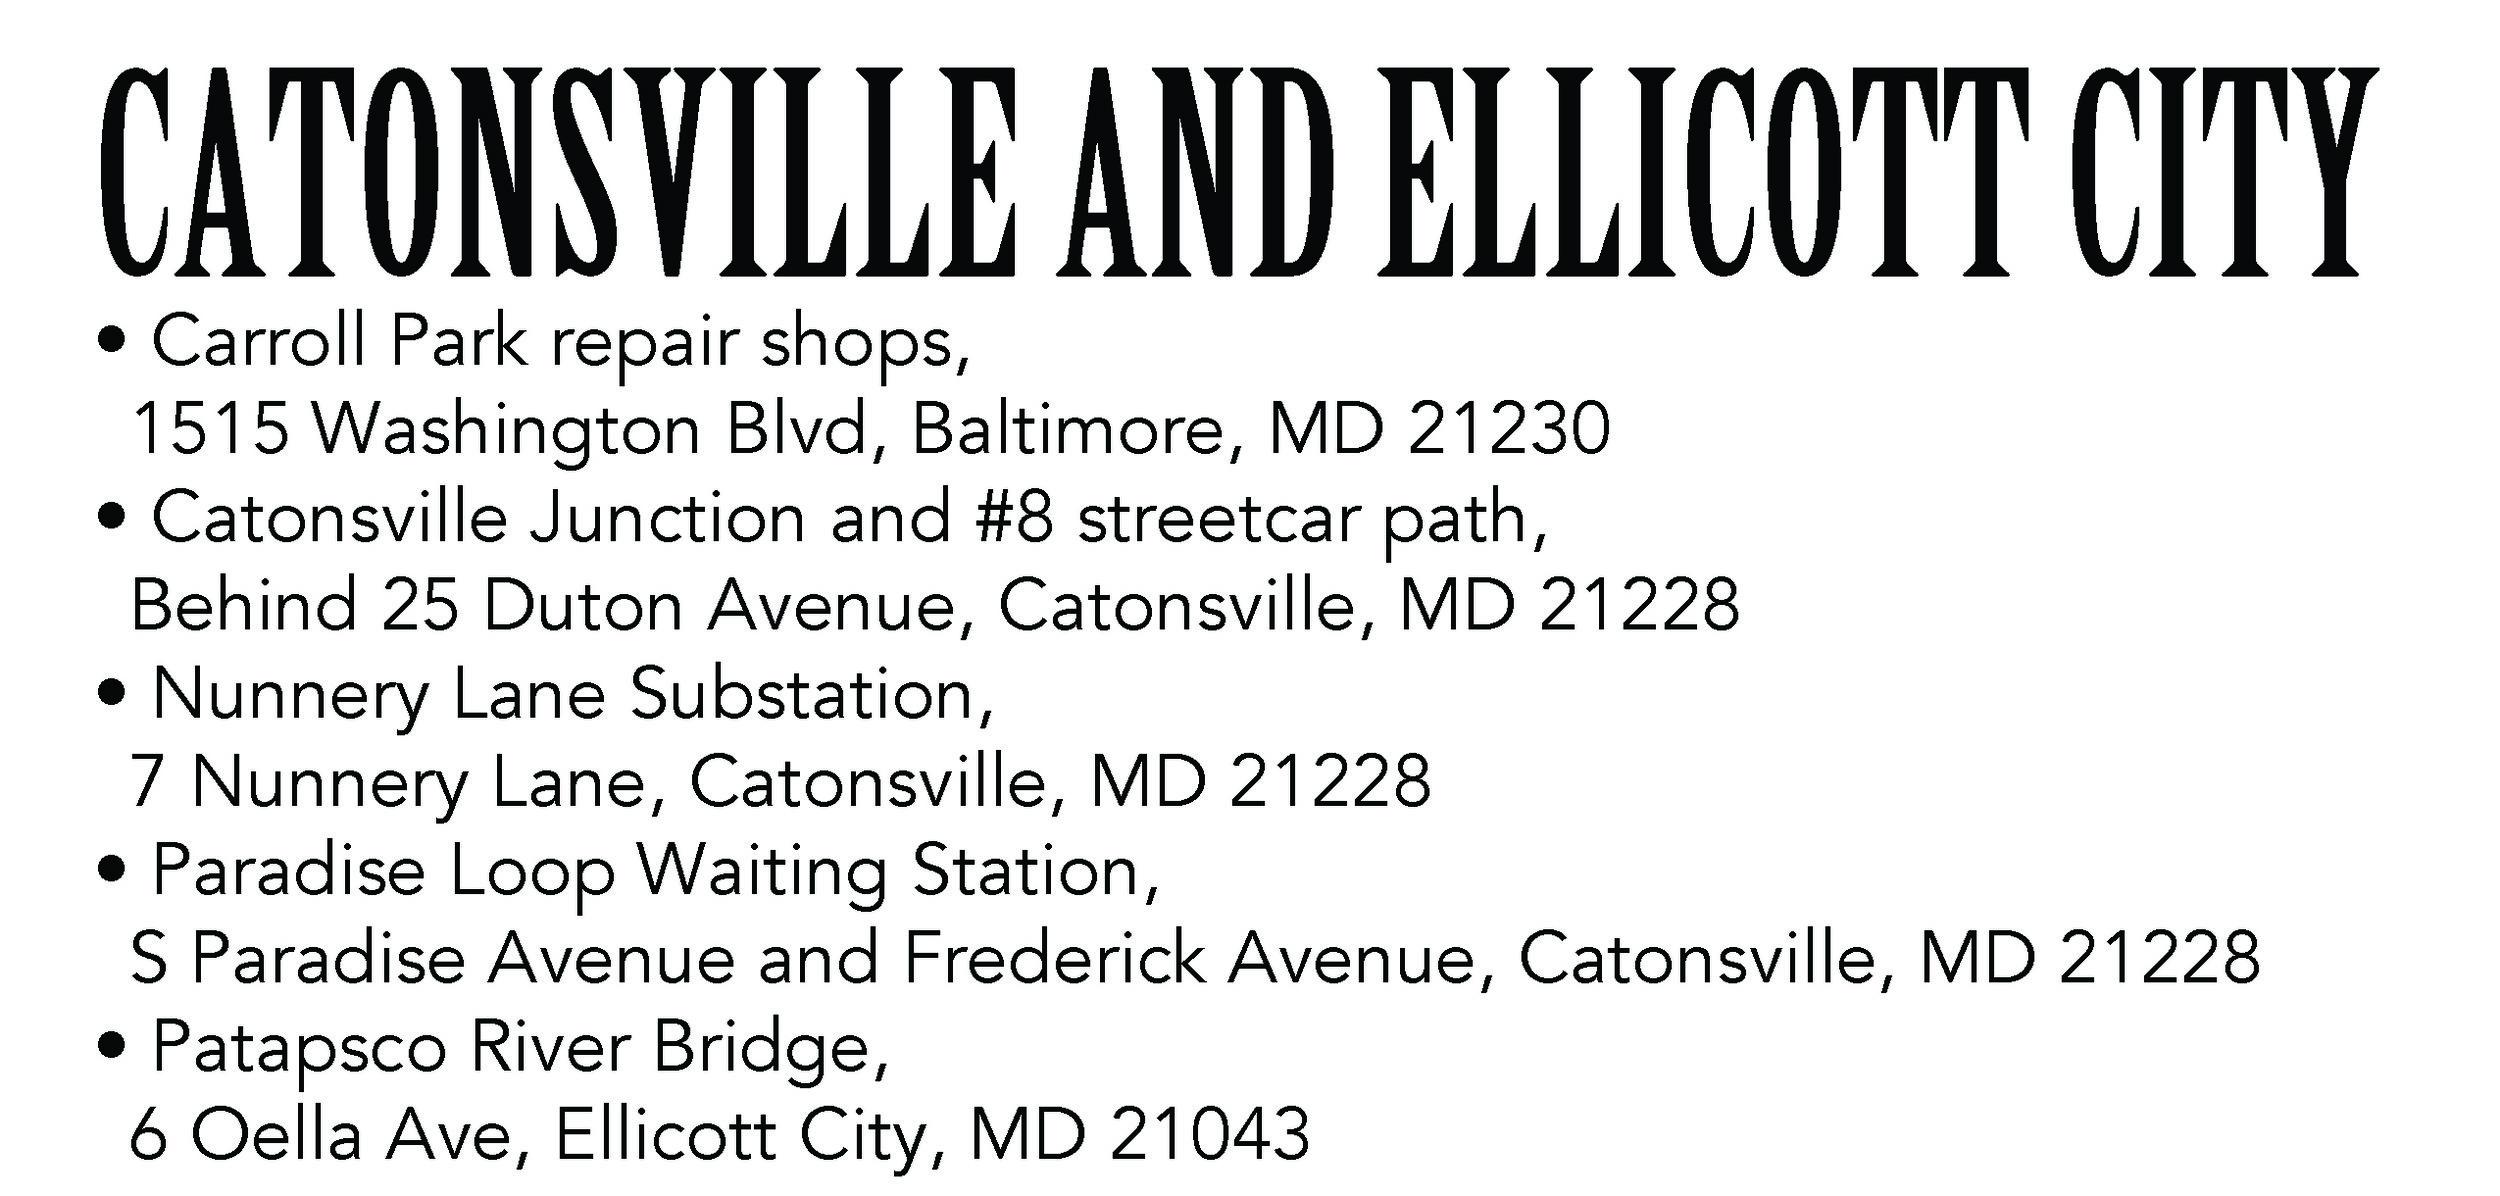 Catonsville and Ellicott City.jpg